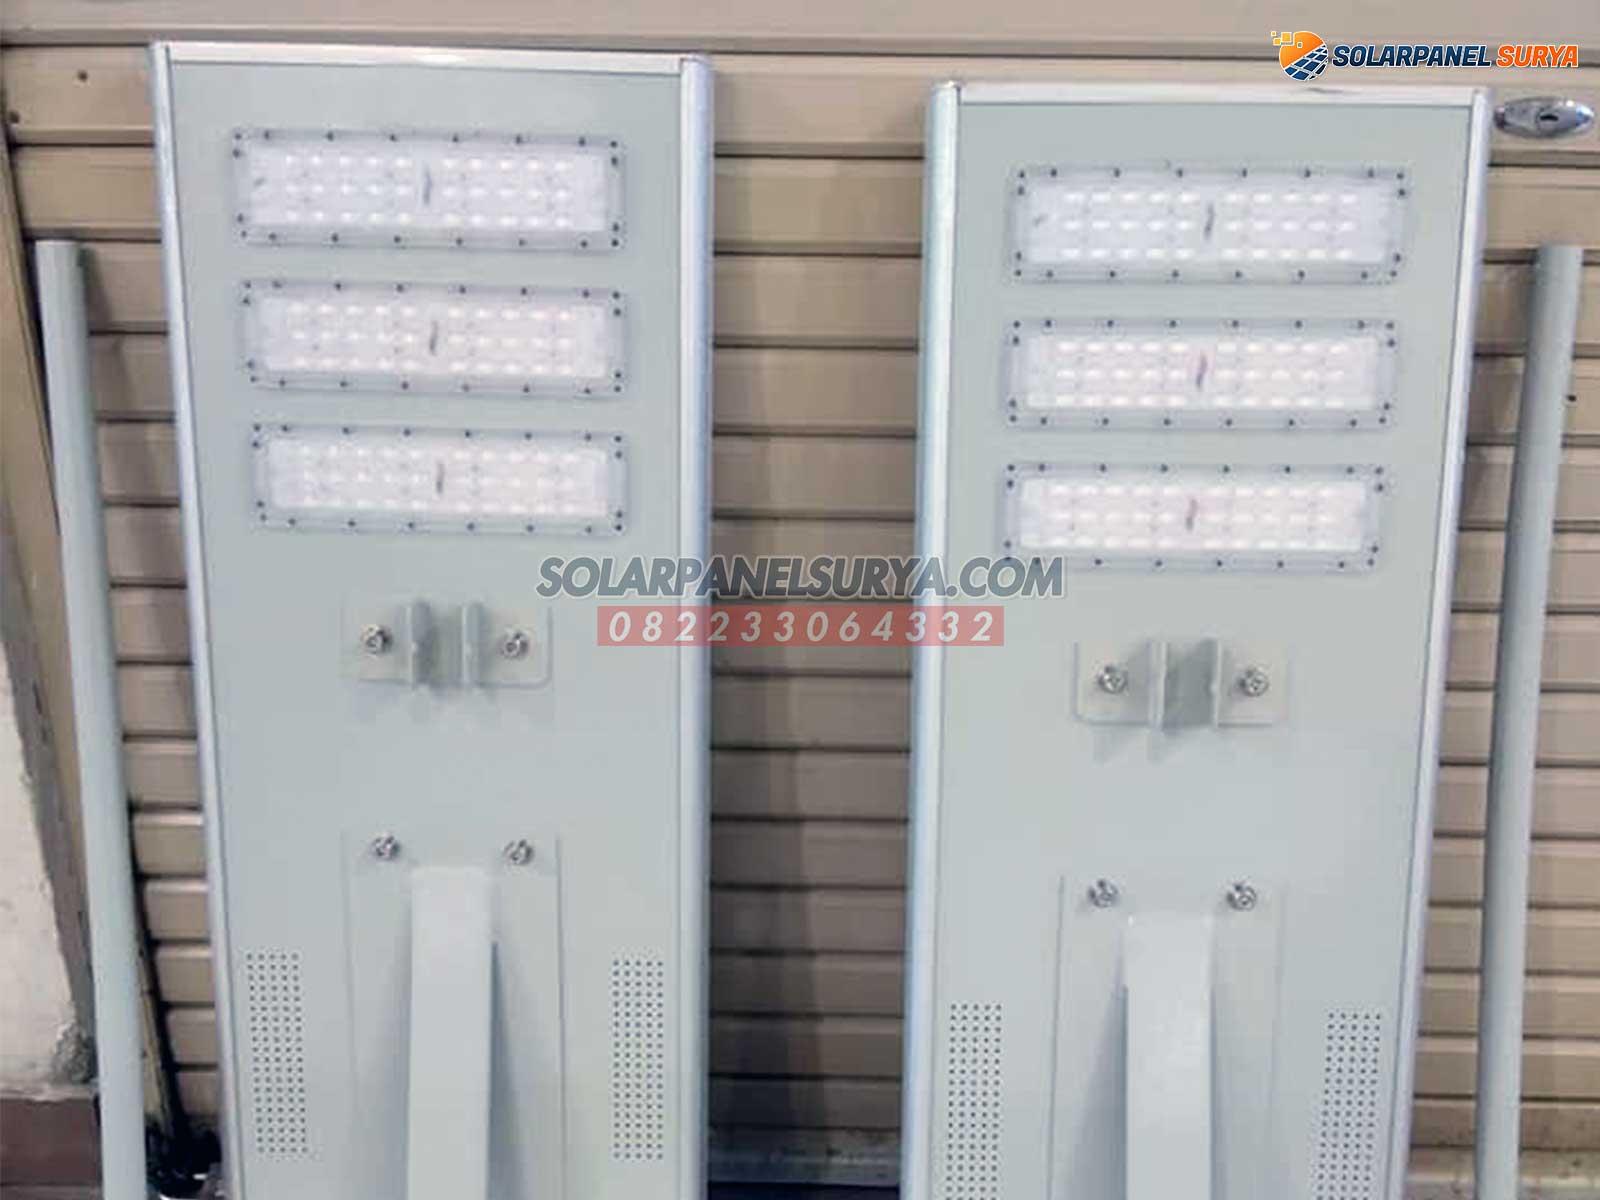 jual Lampu PJU Tenaga Surya All In One 60 Watt Philips